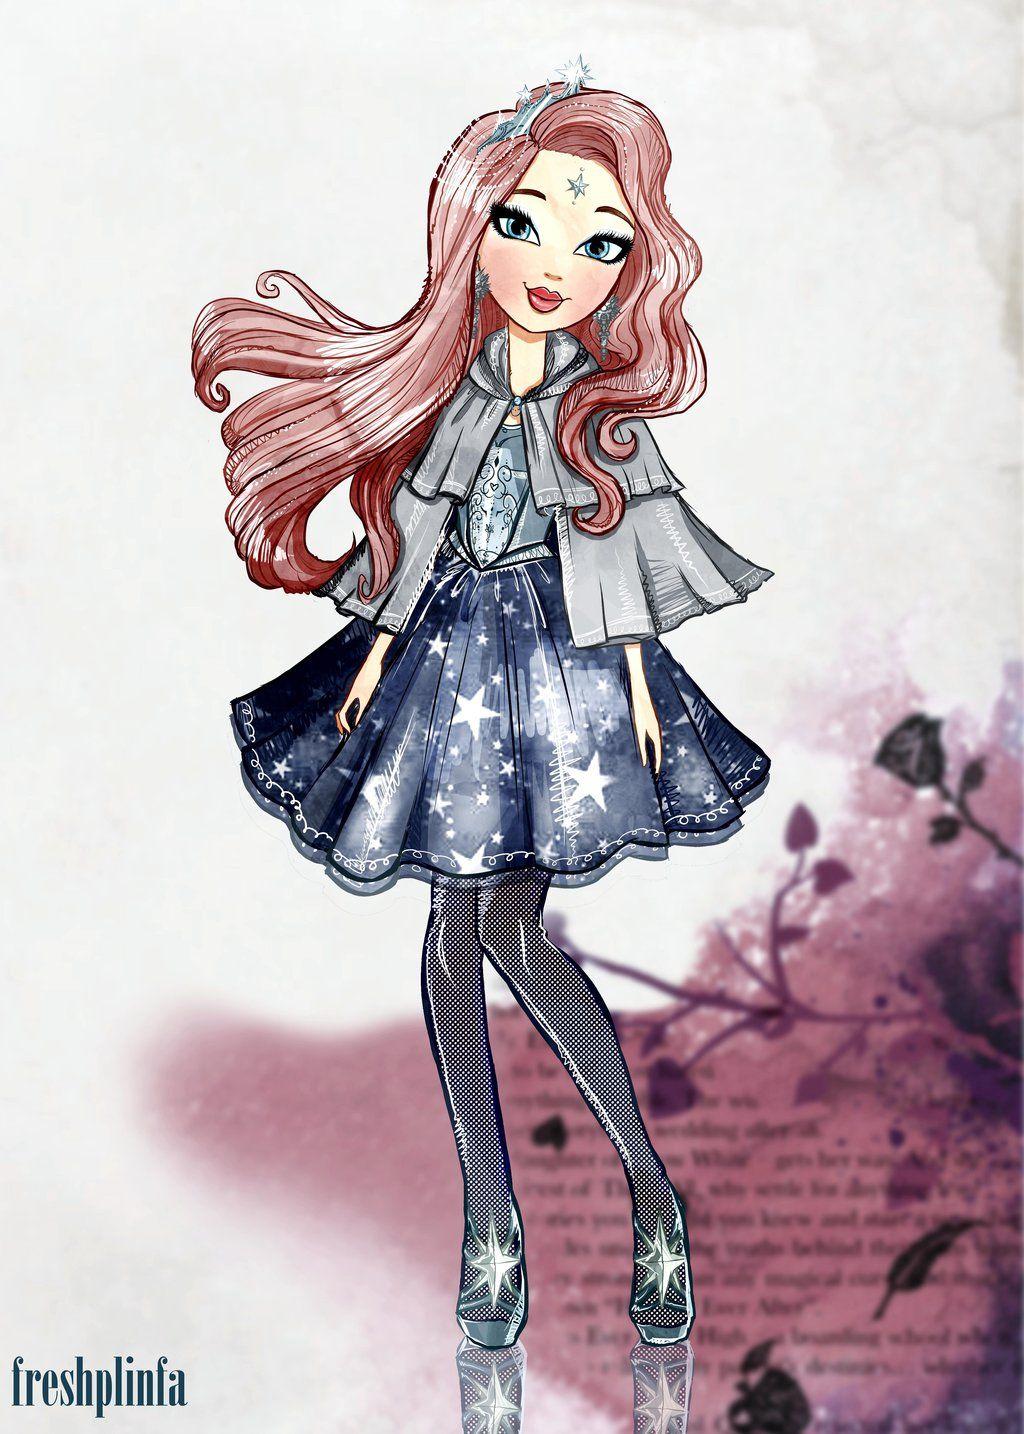 Oc Lucia Lada Star Eah Style By Princeivy Freshp Deviantart Com